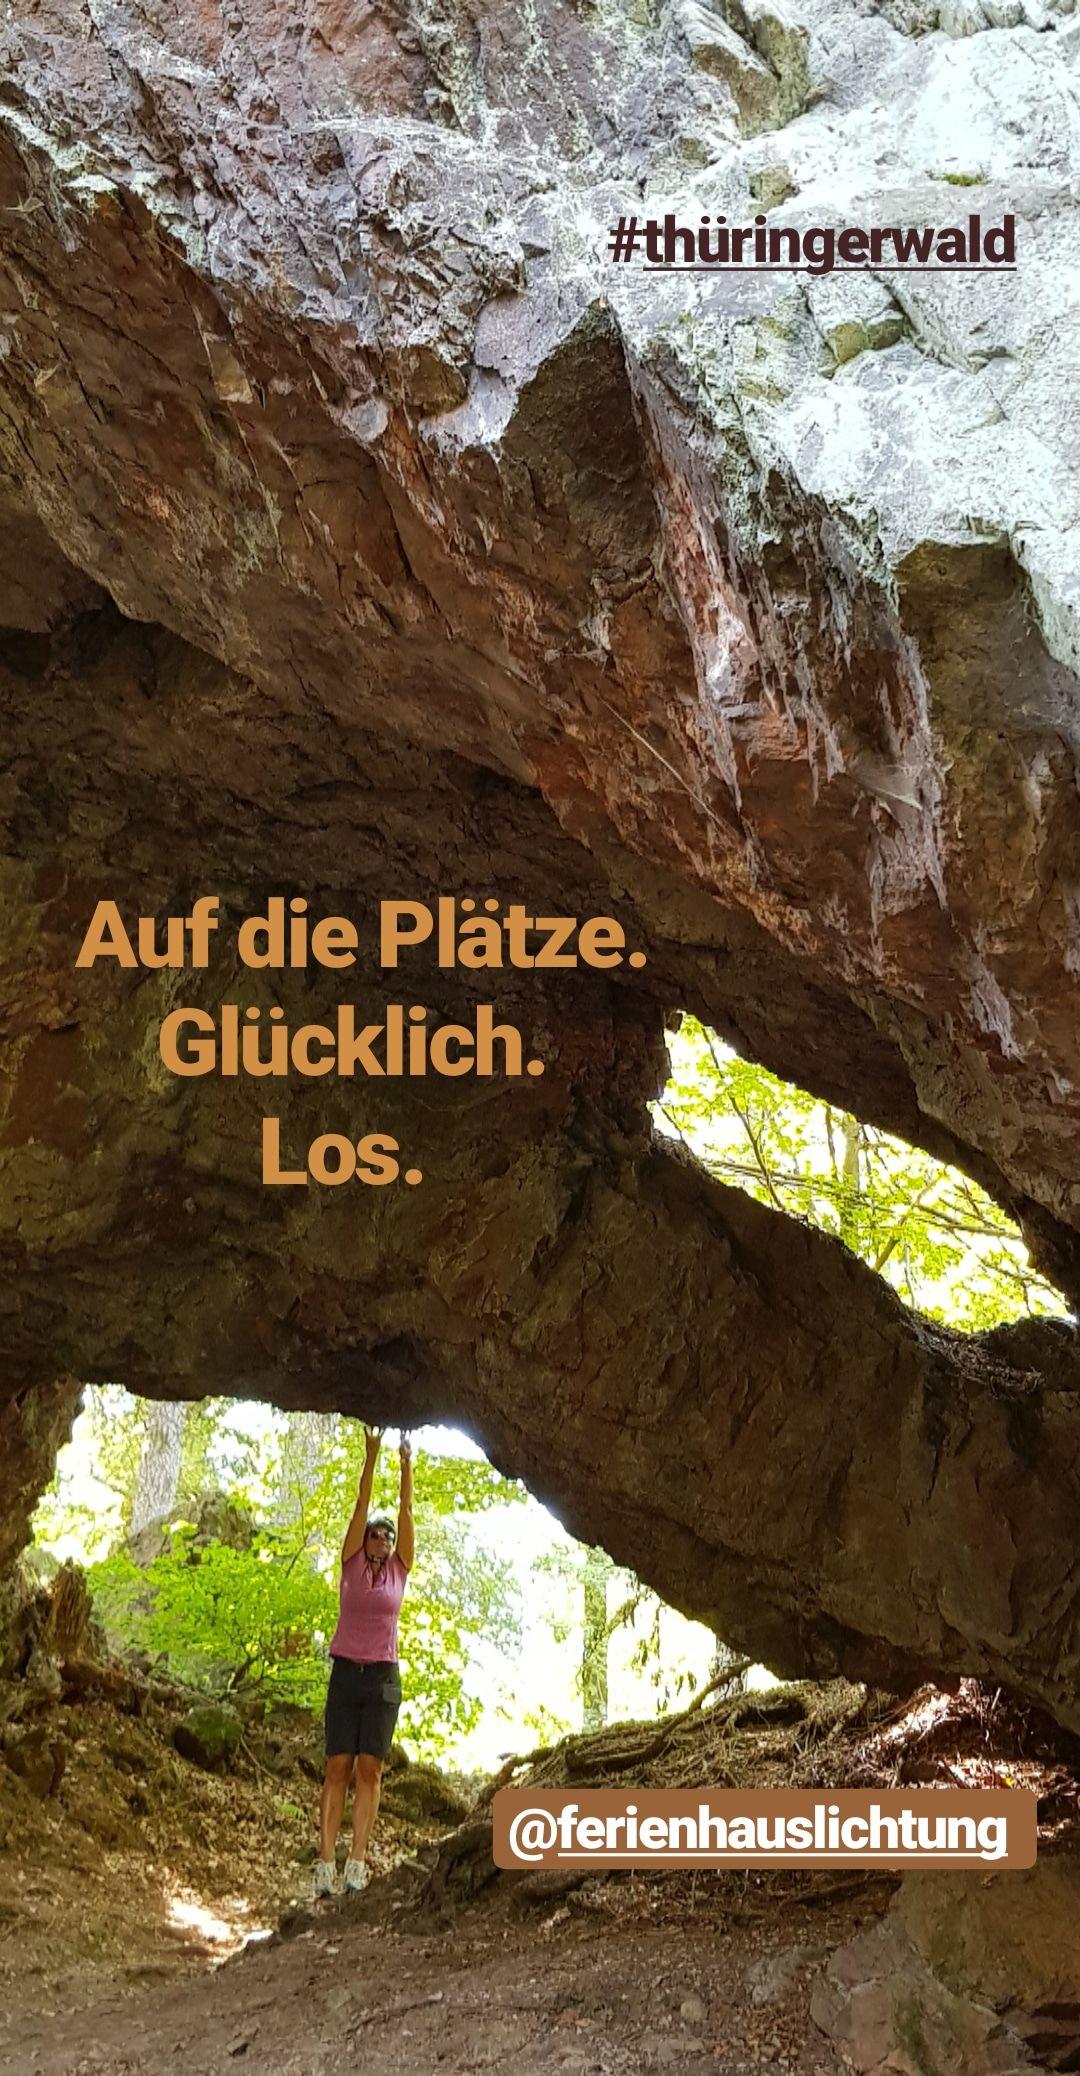 Felsen Märchenwelt Urlaub thüringer wald, Thüringer wald